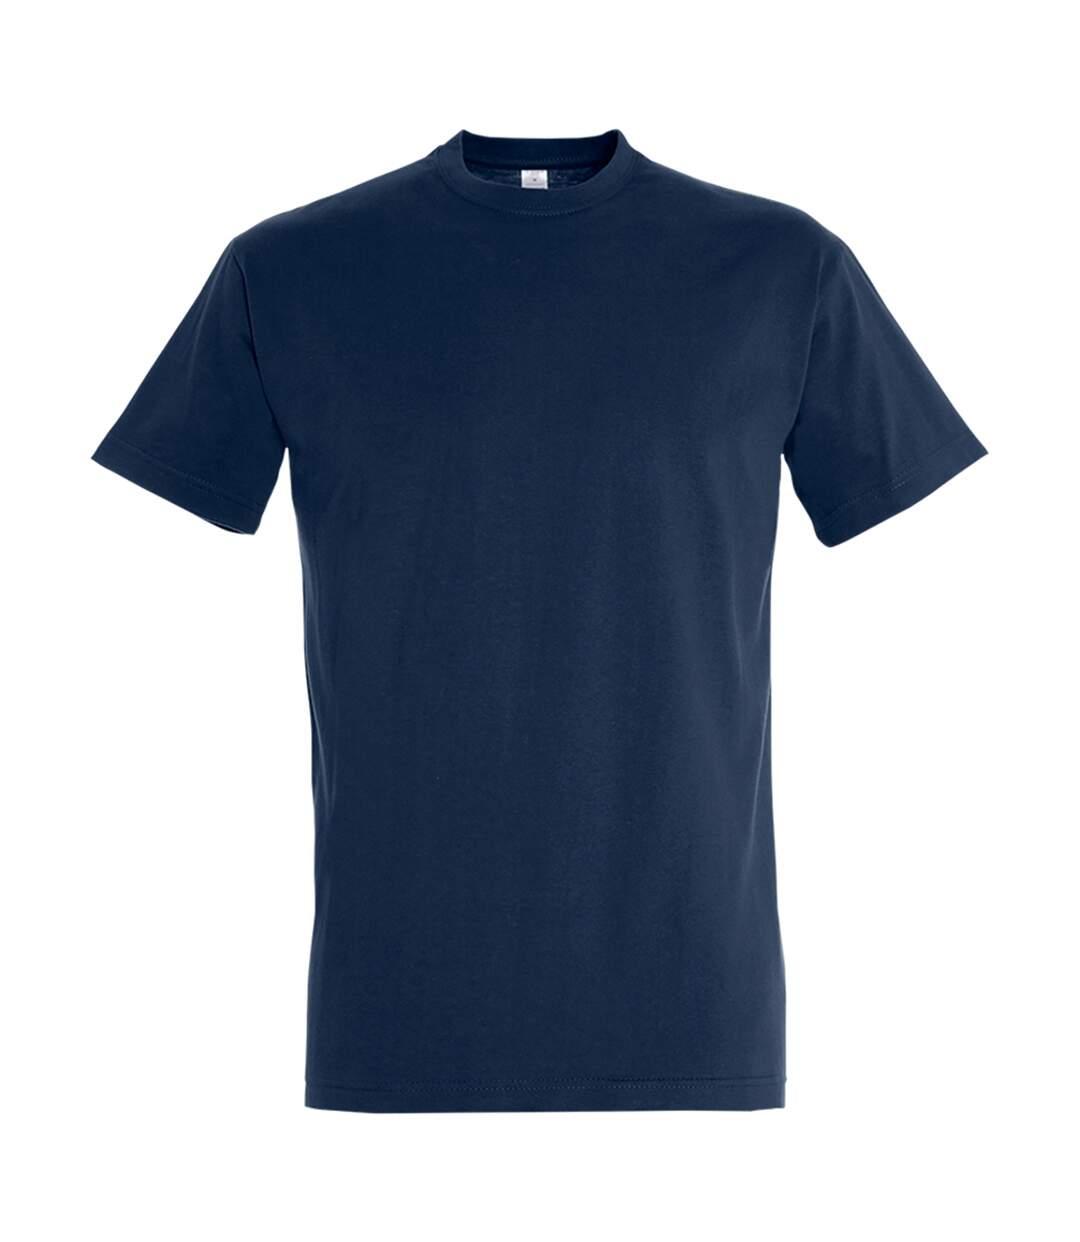 SOLS Mens Imperial Heavyweight Short Sleeve T-Shirt (French Navy) - UTPC290